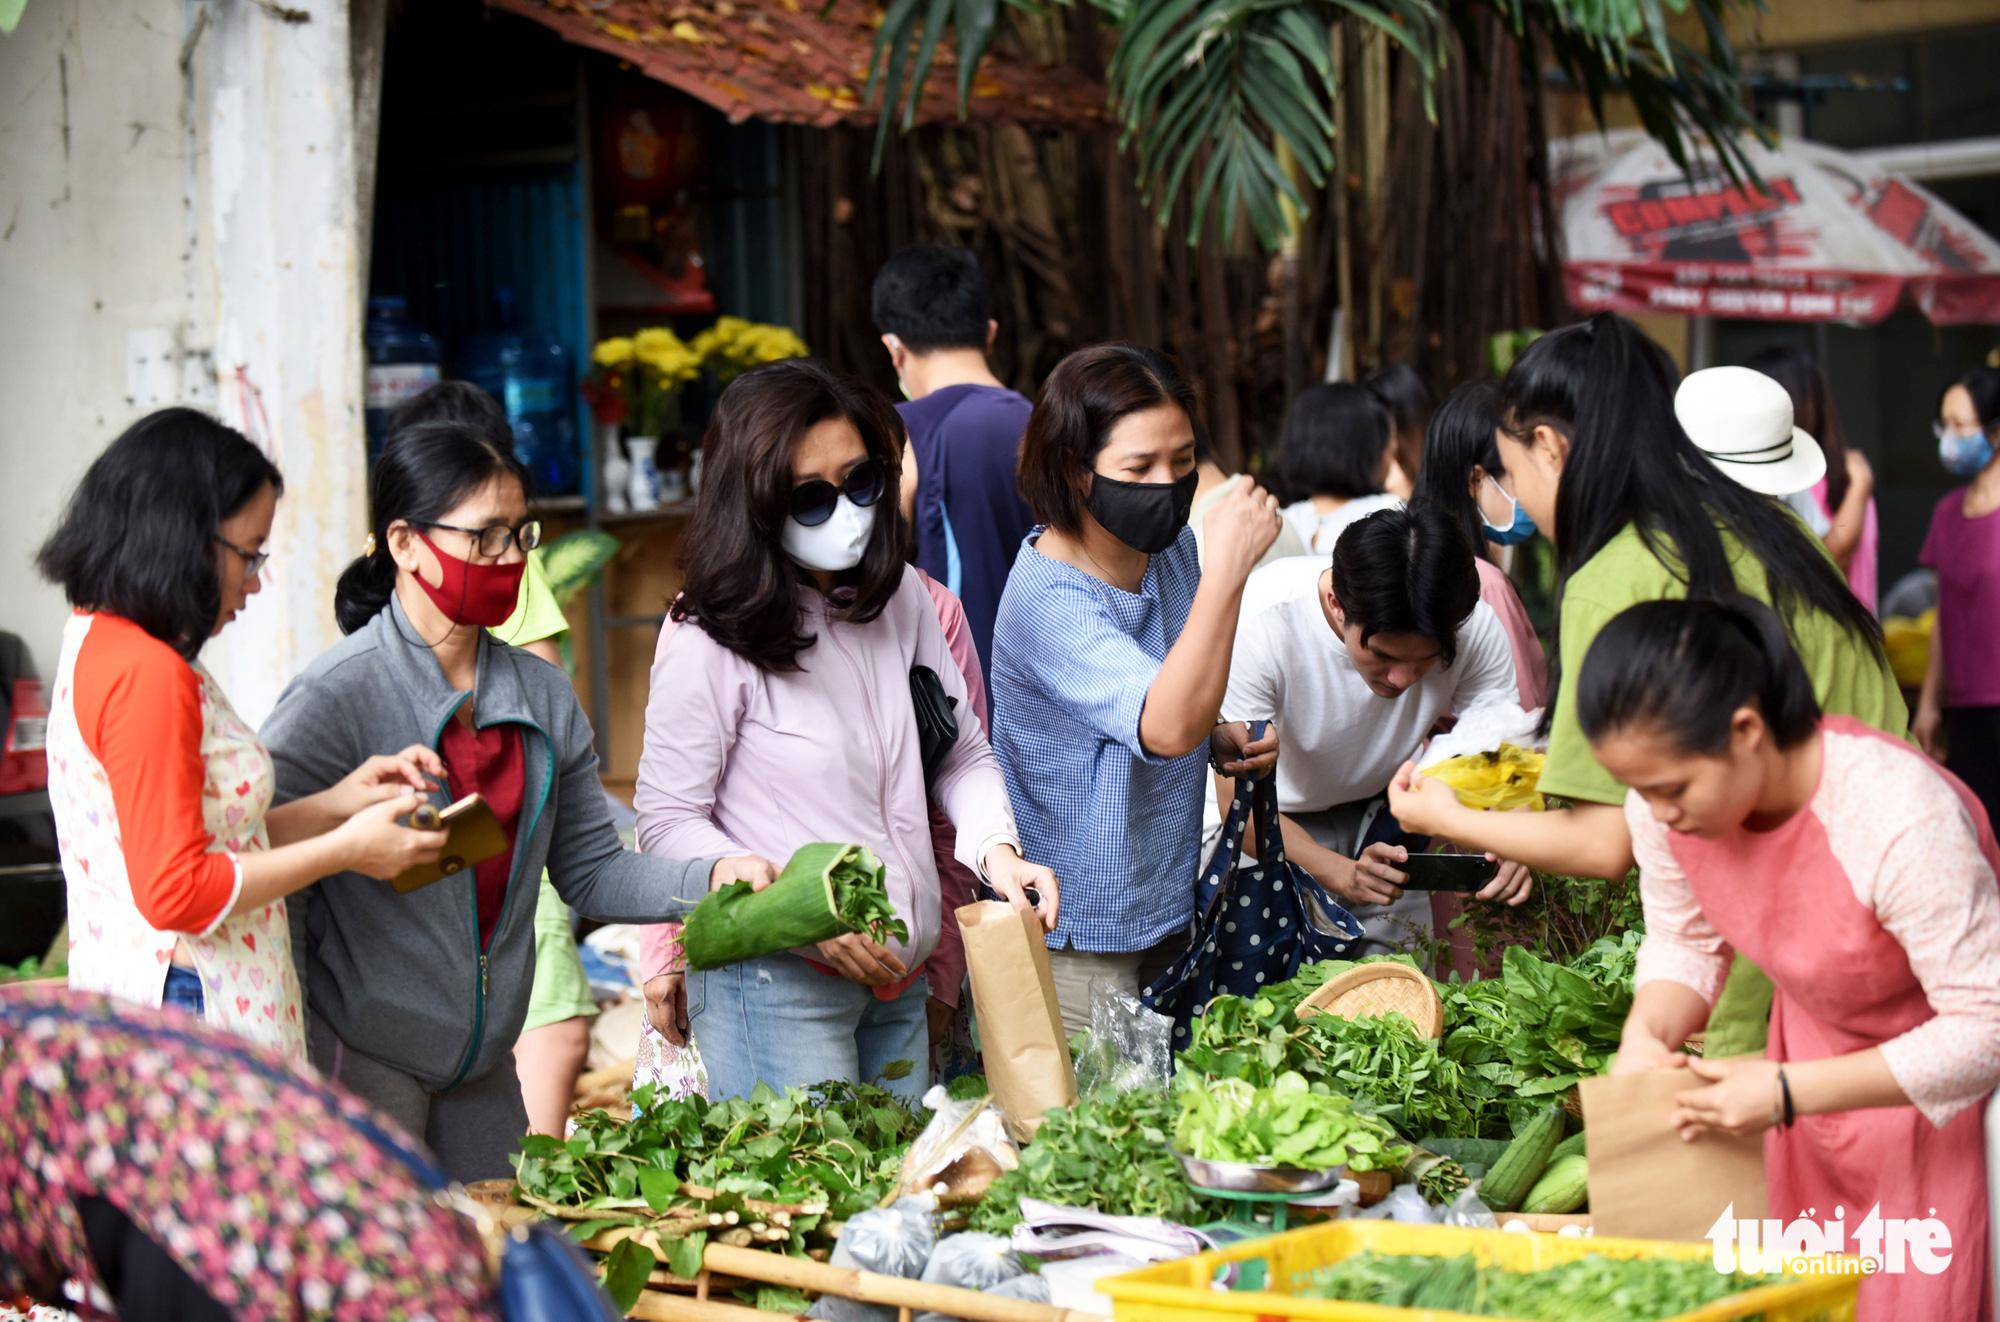 Shop for nostalgia at this weekend countryside market in Saigon